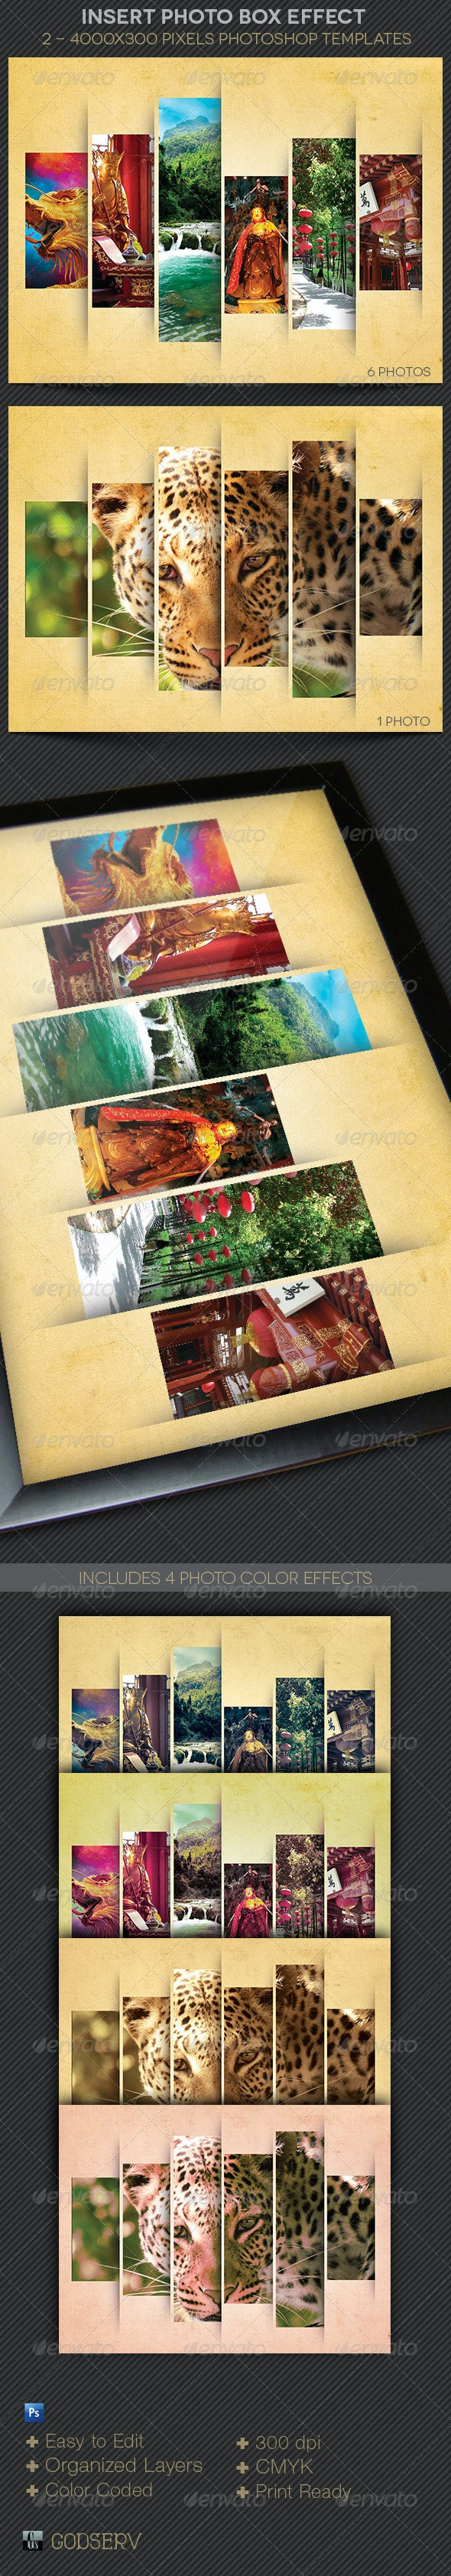 Insert Photo Box Effect Template - Artistic Photo Templates